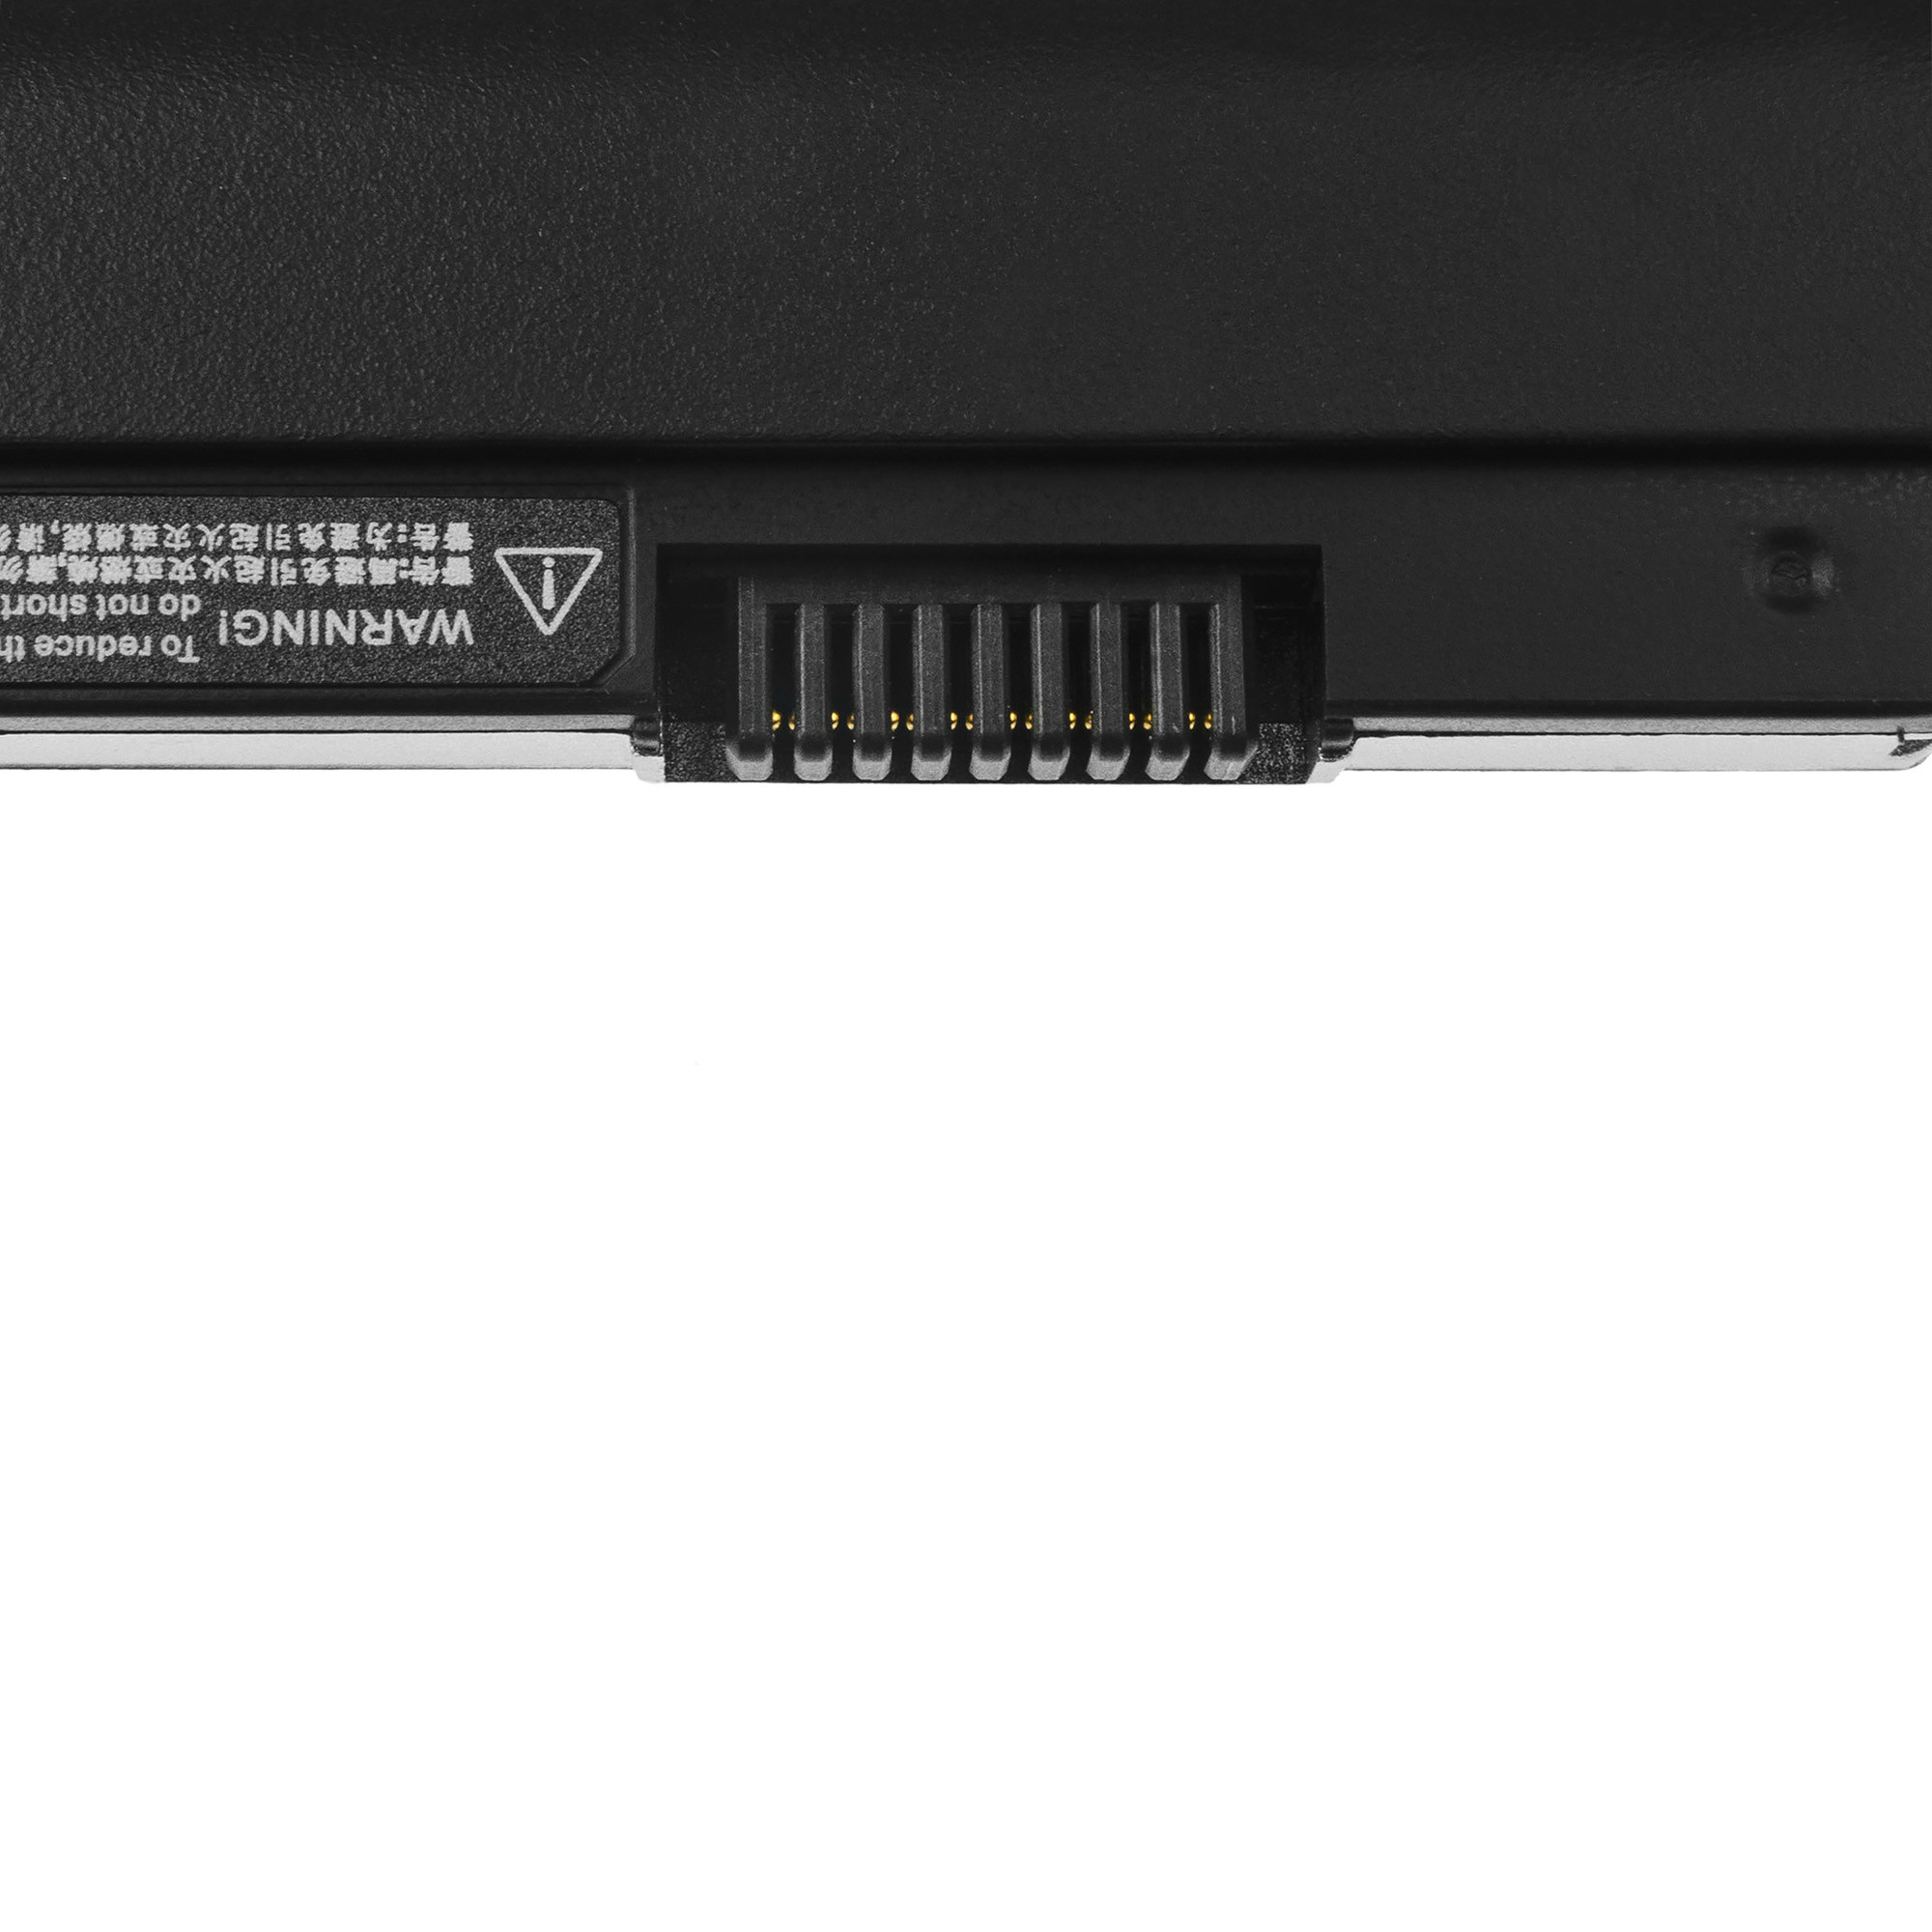 Green Cell PRO Battery LA04 LA04DF for HP Pavilion 15-N 15-N025SW 15-N065SW 15-N070SW 15-N080SW 15-N225SW 15-N230SW 15-N280SW